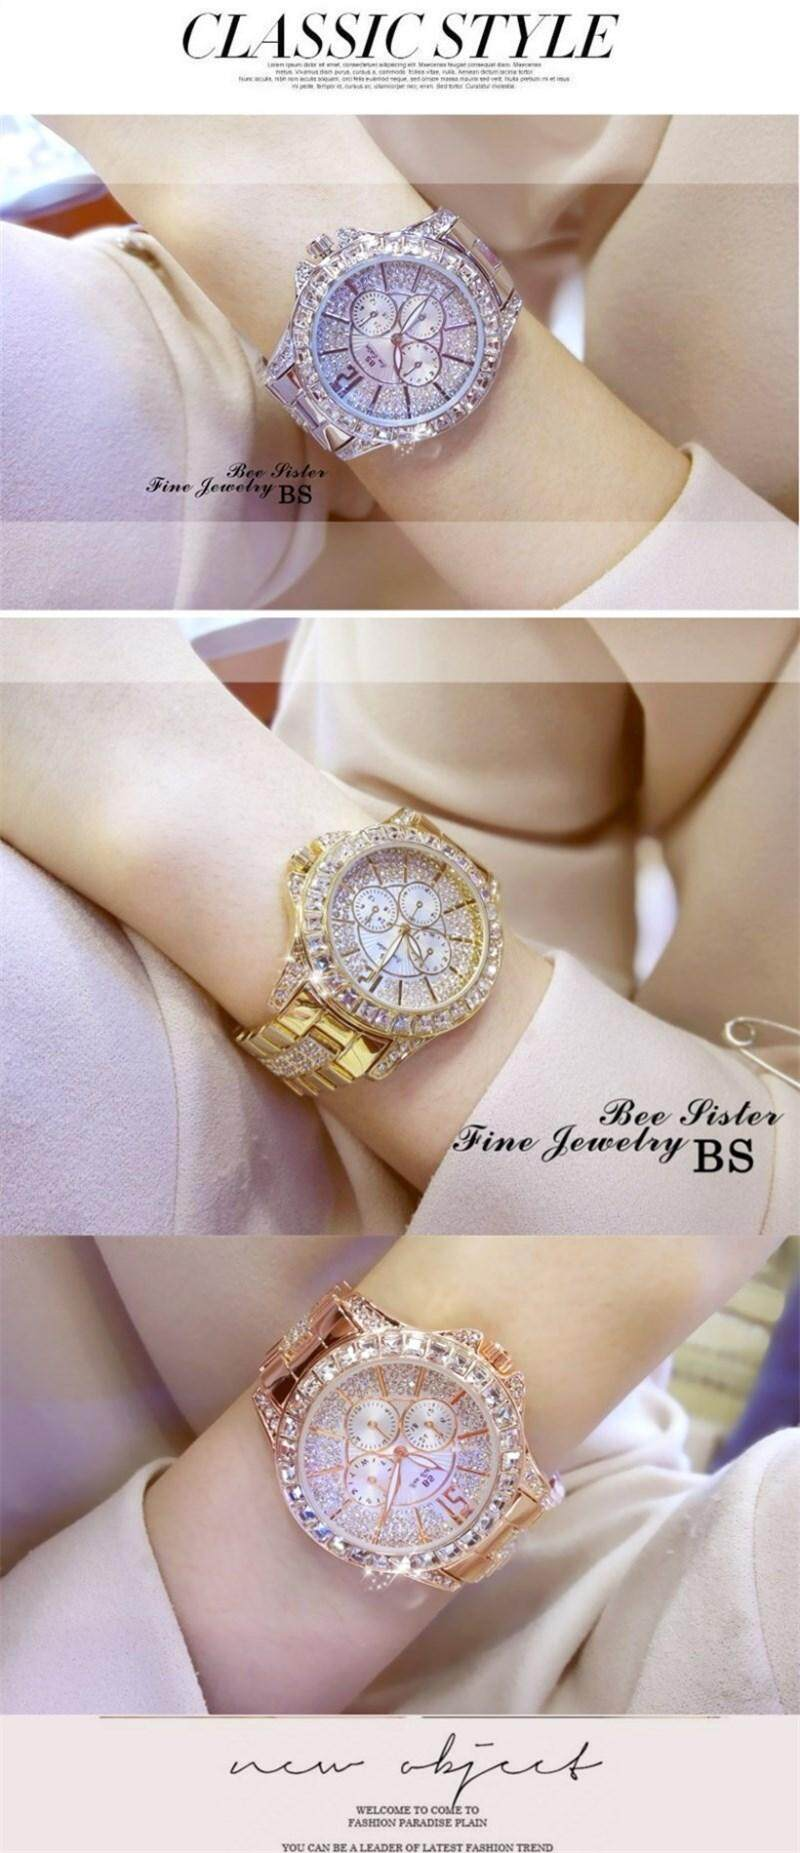 bs-womenquartzwatch-branddiamond-detail02.jpg